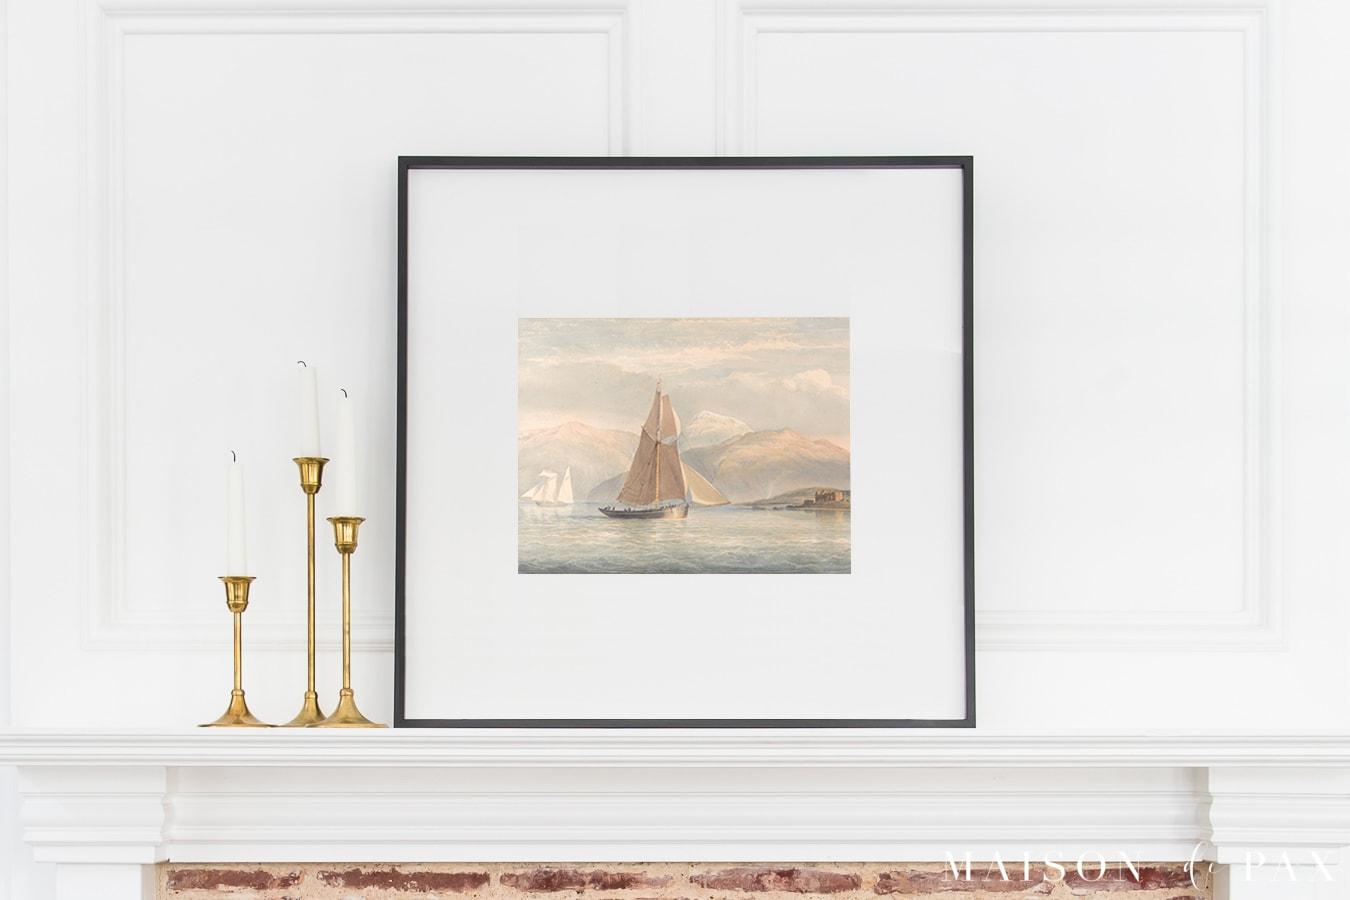 sailboat print in black frame above fireplace | Maison de Pax